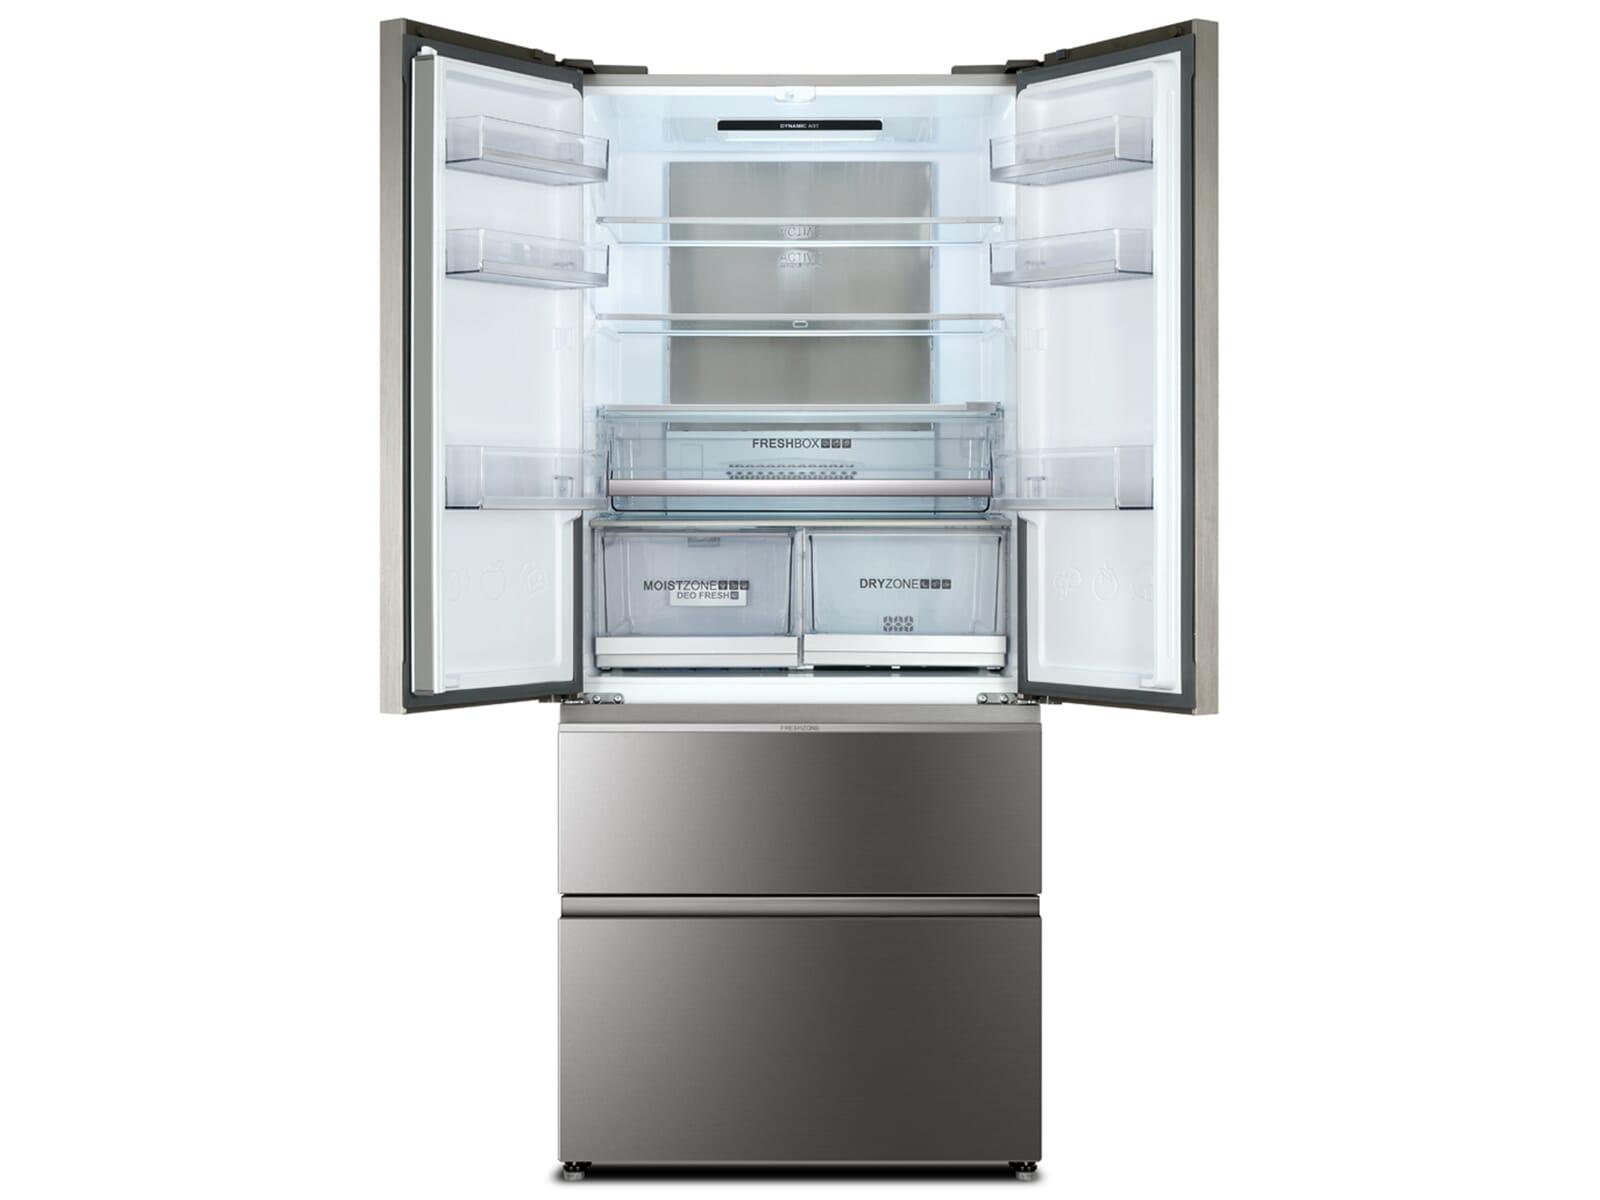 Aeg Kühlschrank French Door : Haier hb18fgsaaa french door kühl gefrier kombination edelstahl glas